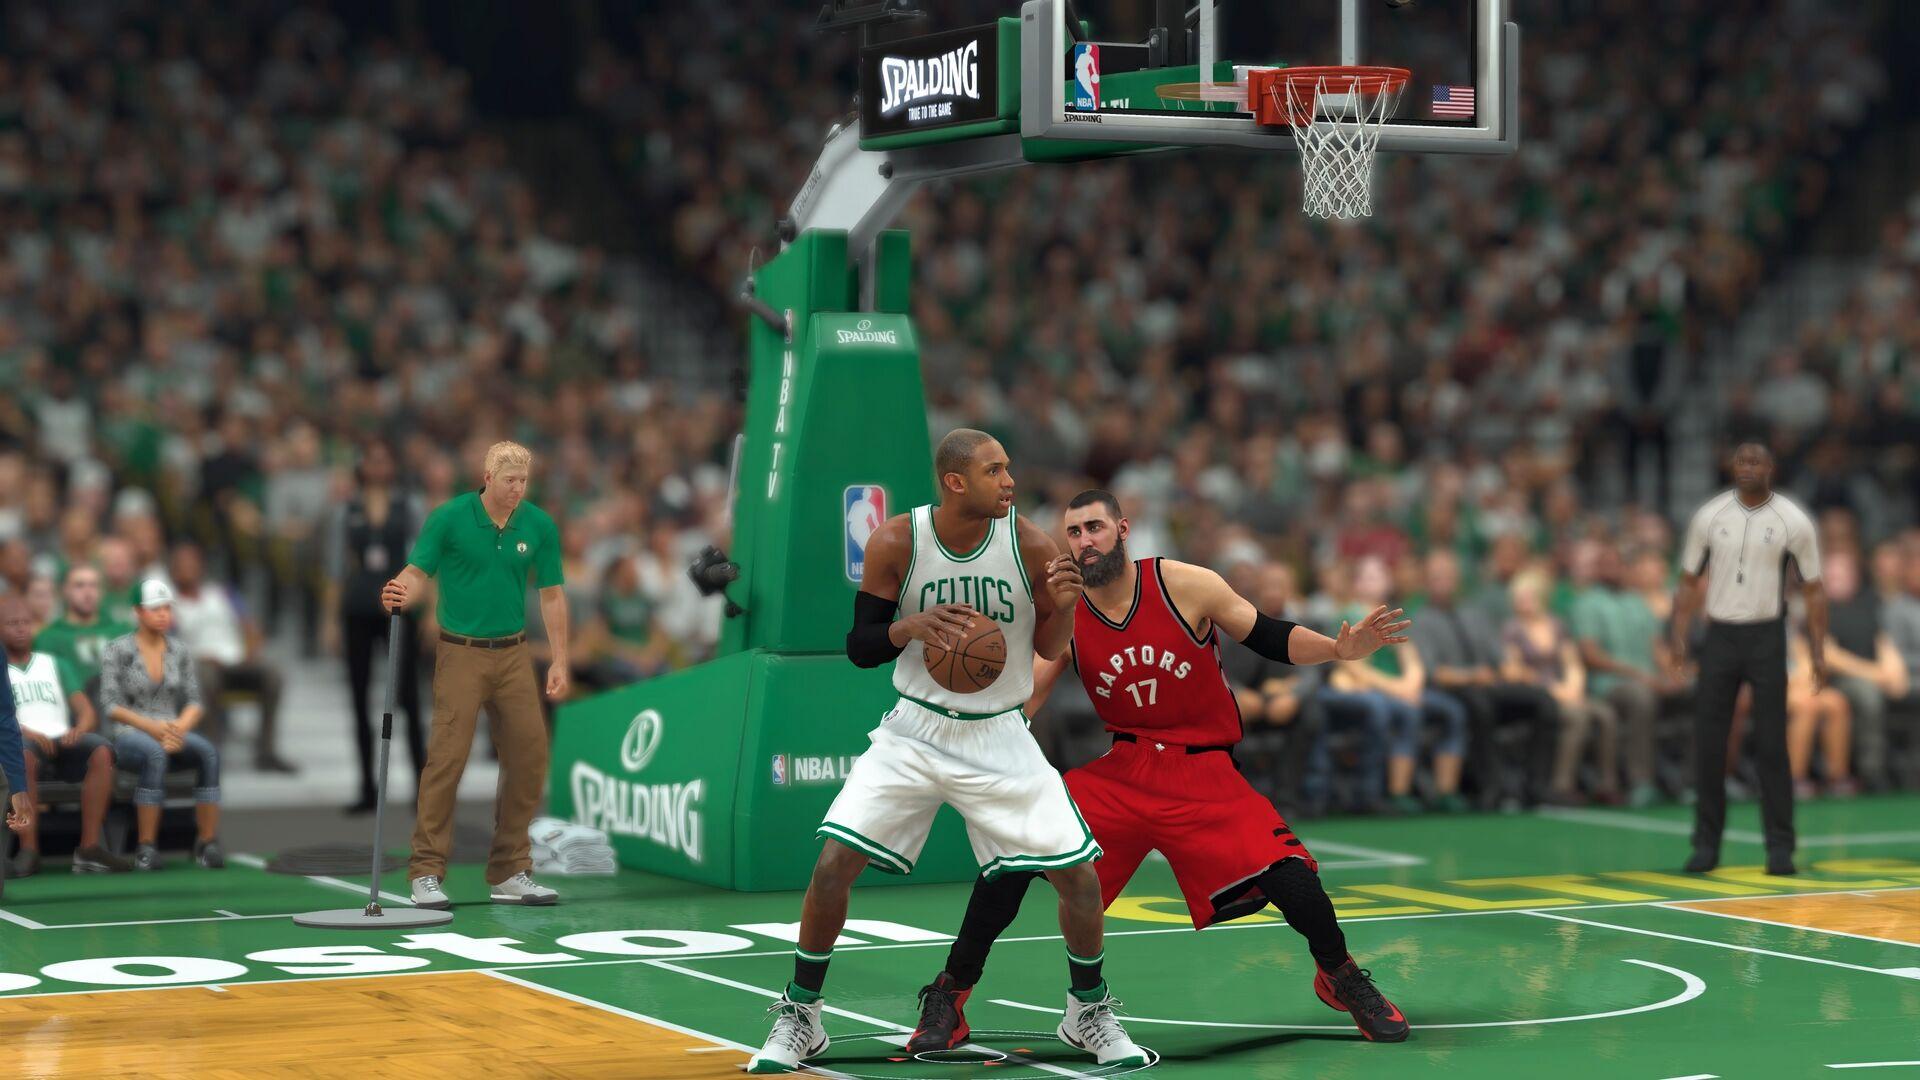 Nba Finals Game 1 Score By Quarter | All Basketball Scores Info